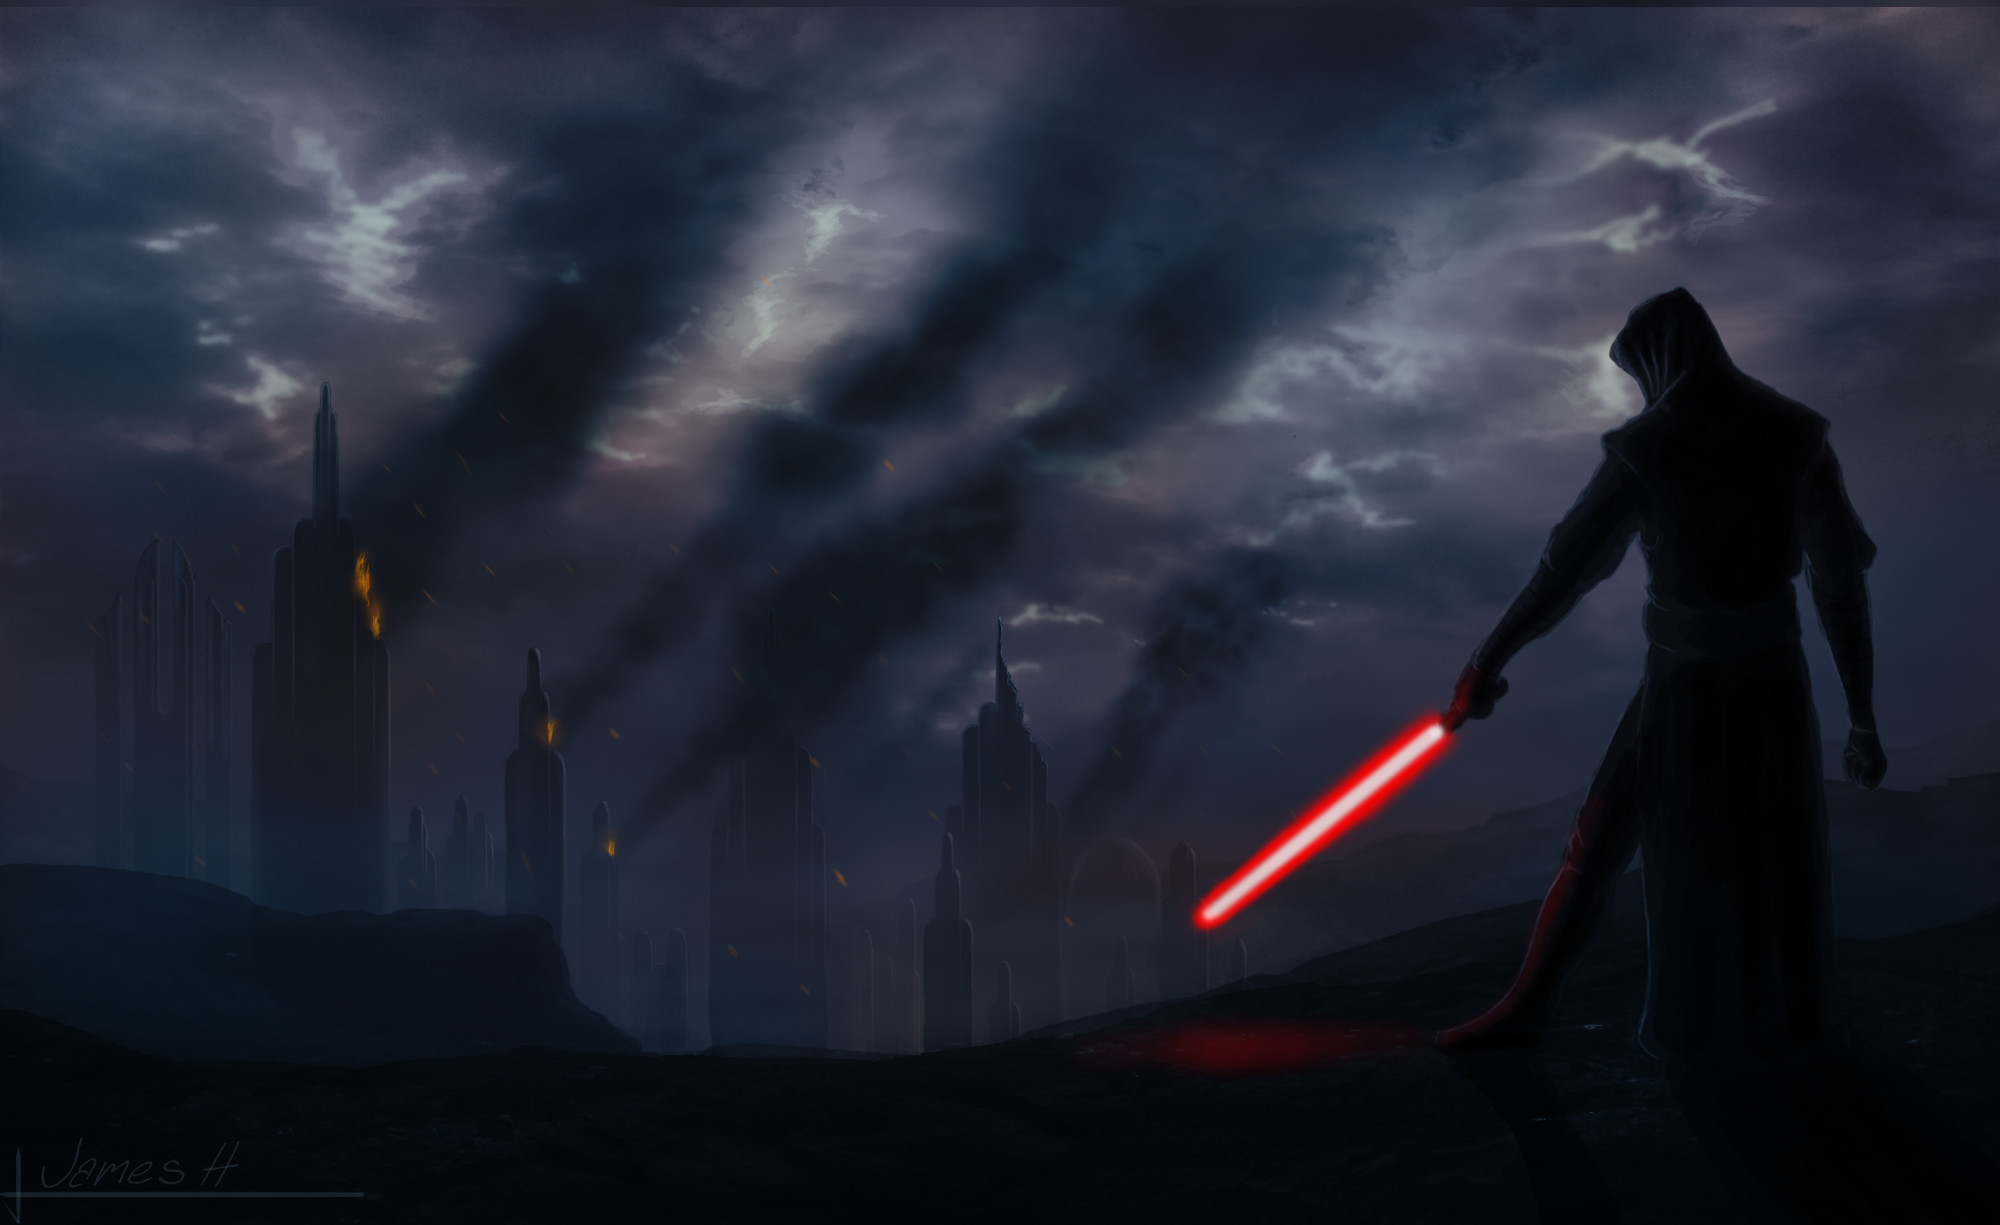 FunMozar – Star Wars Wallpapers Part 4